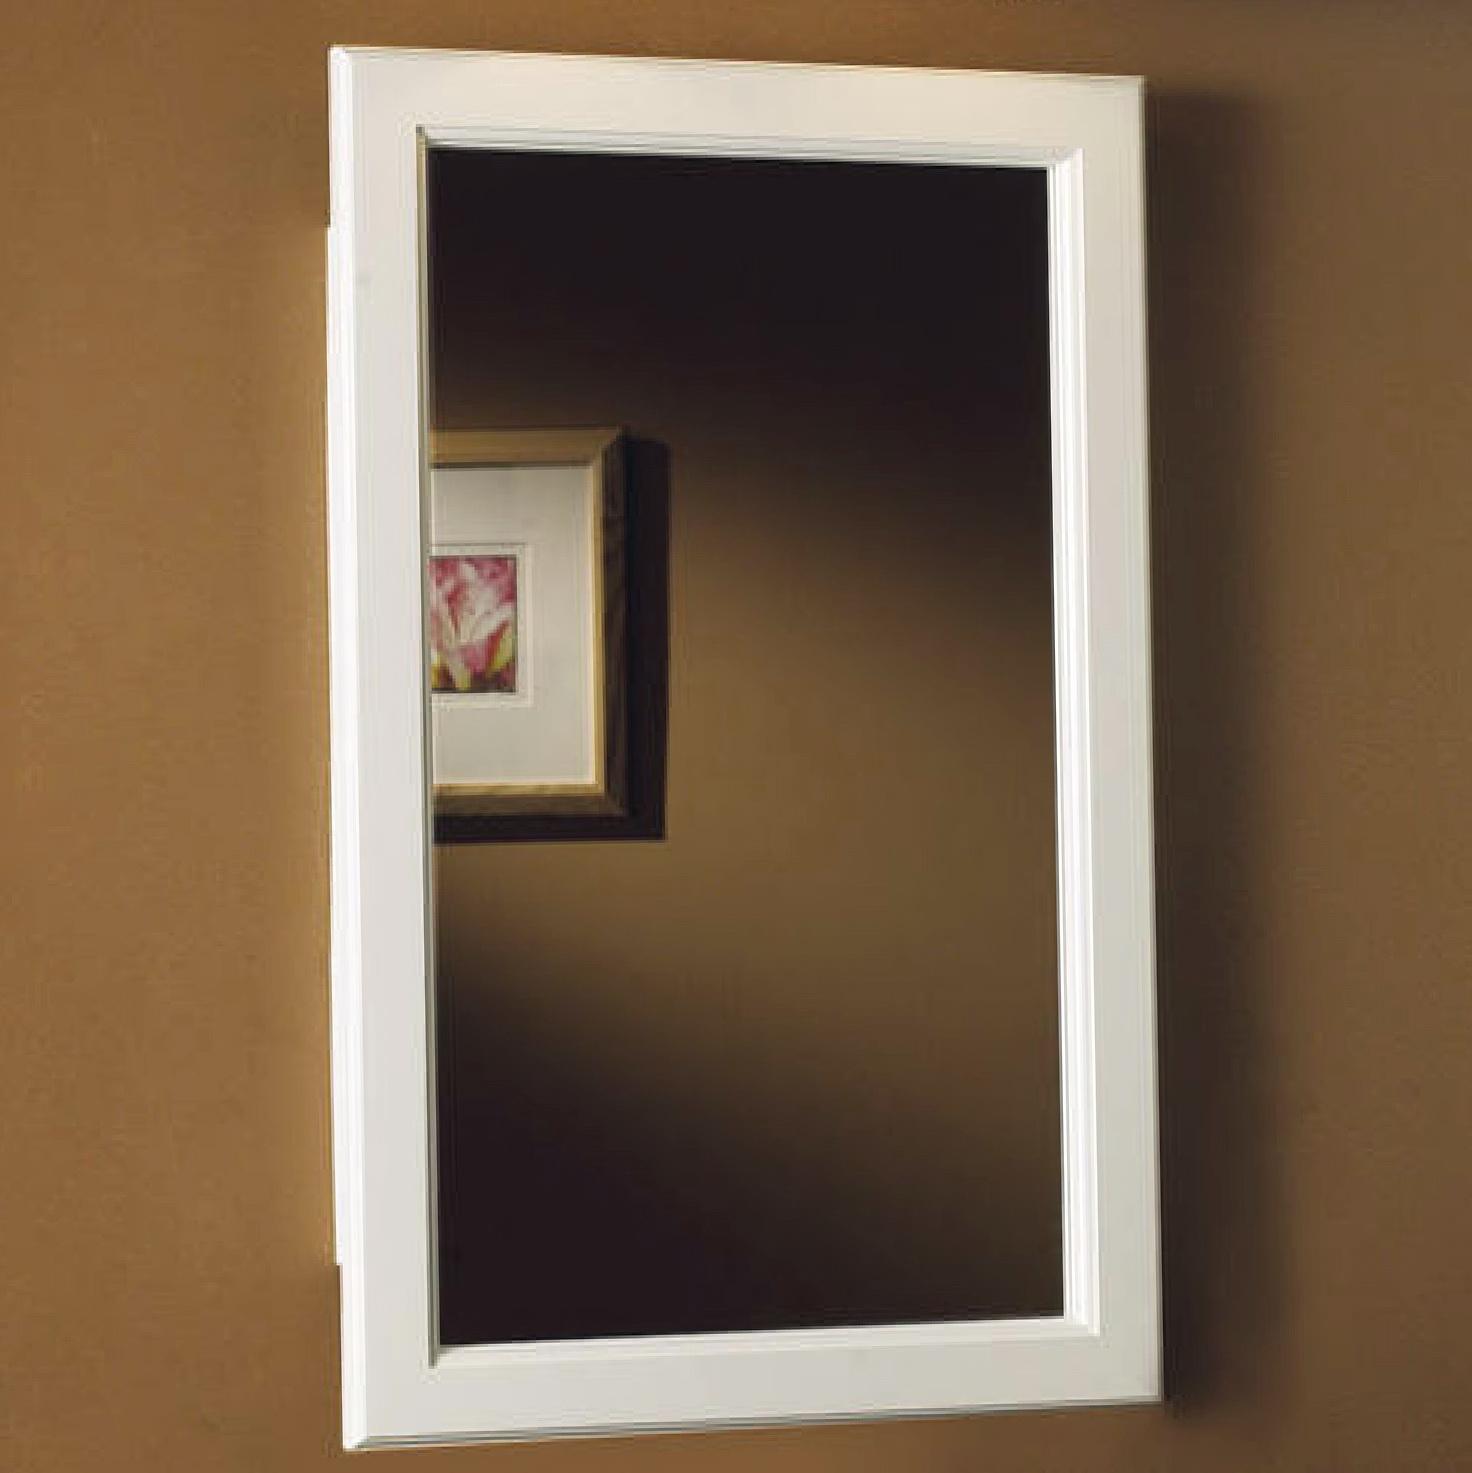 Bathroom Medicine Cabinets With Mirrors Recessed Home Design Ideas